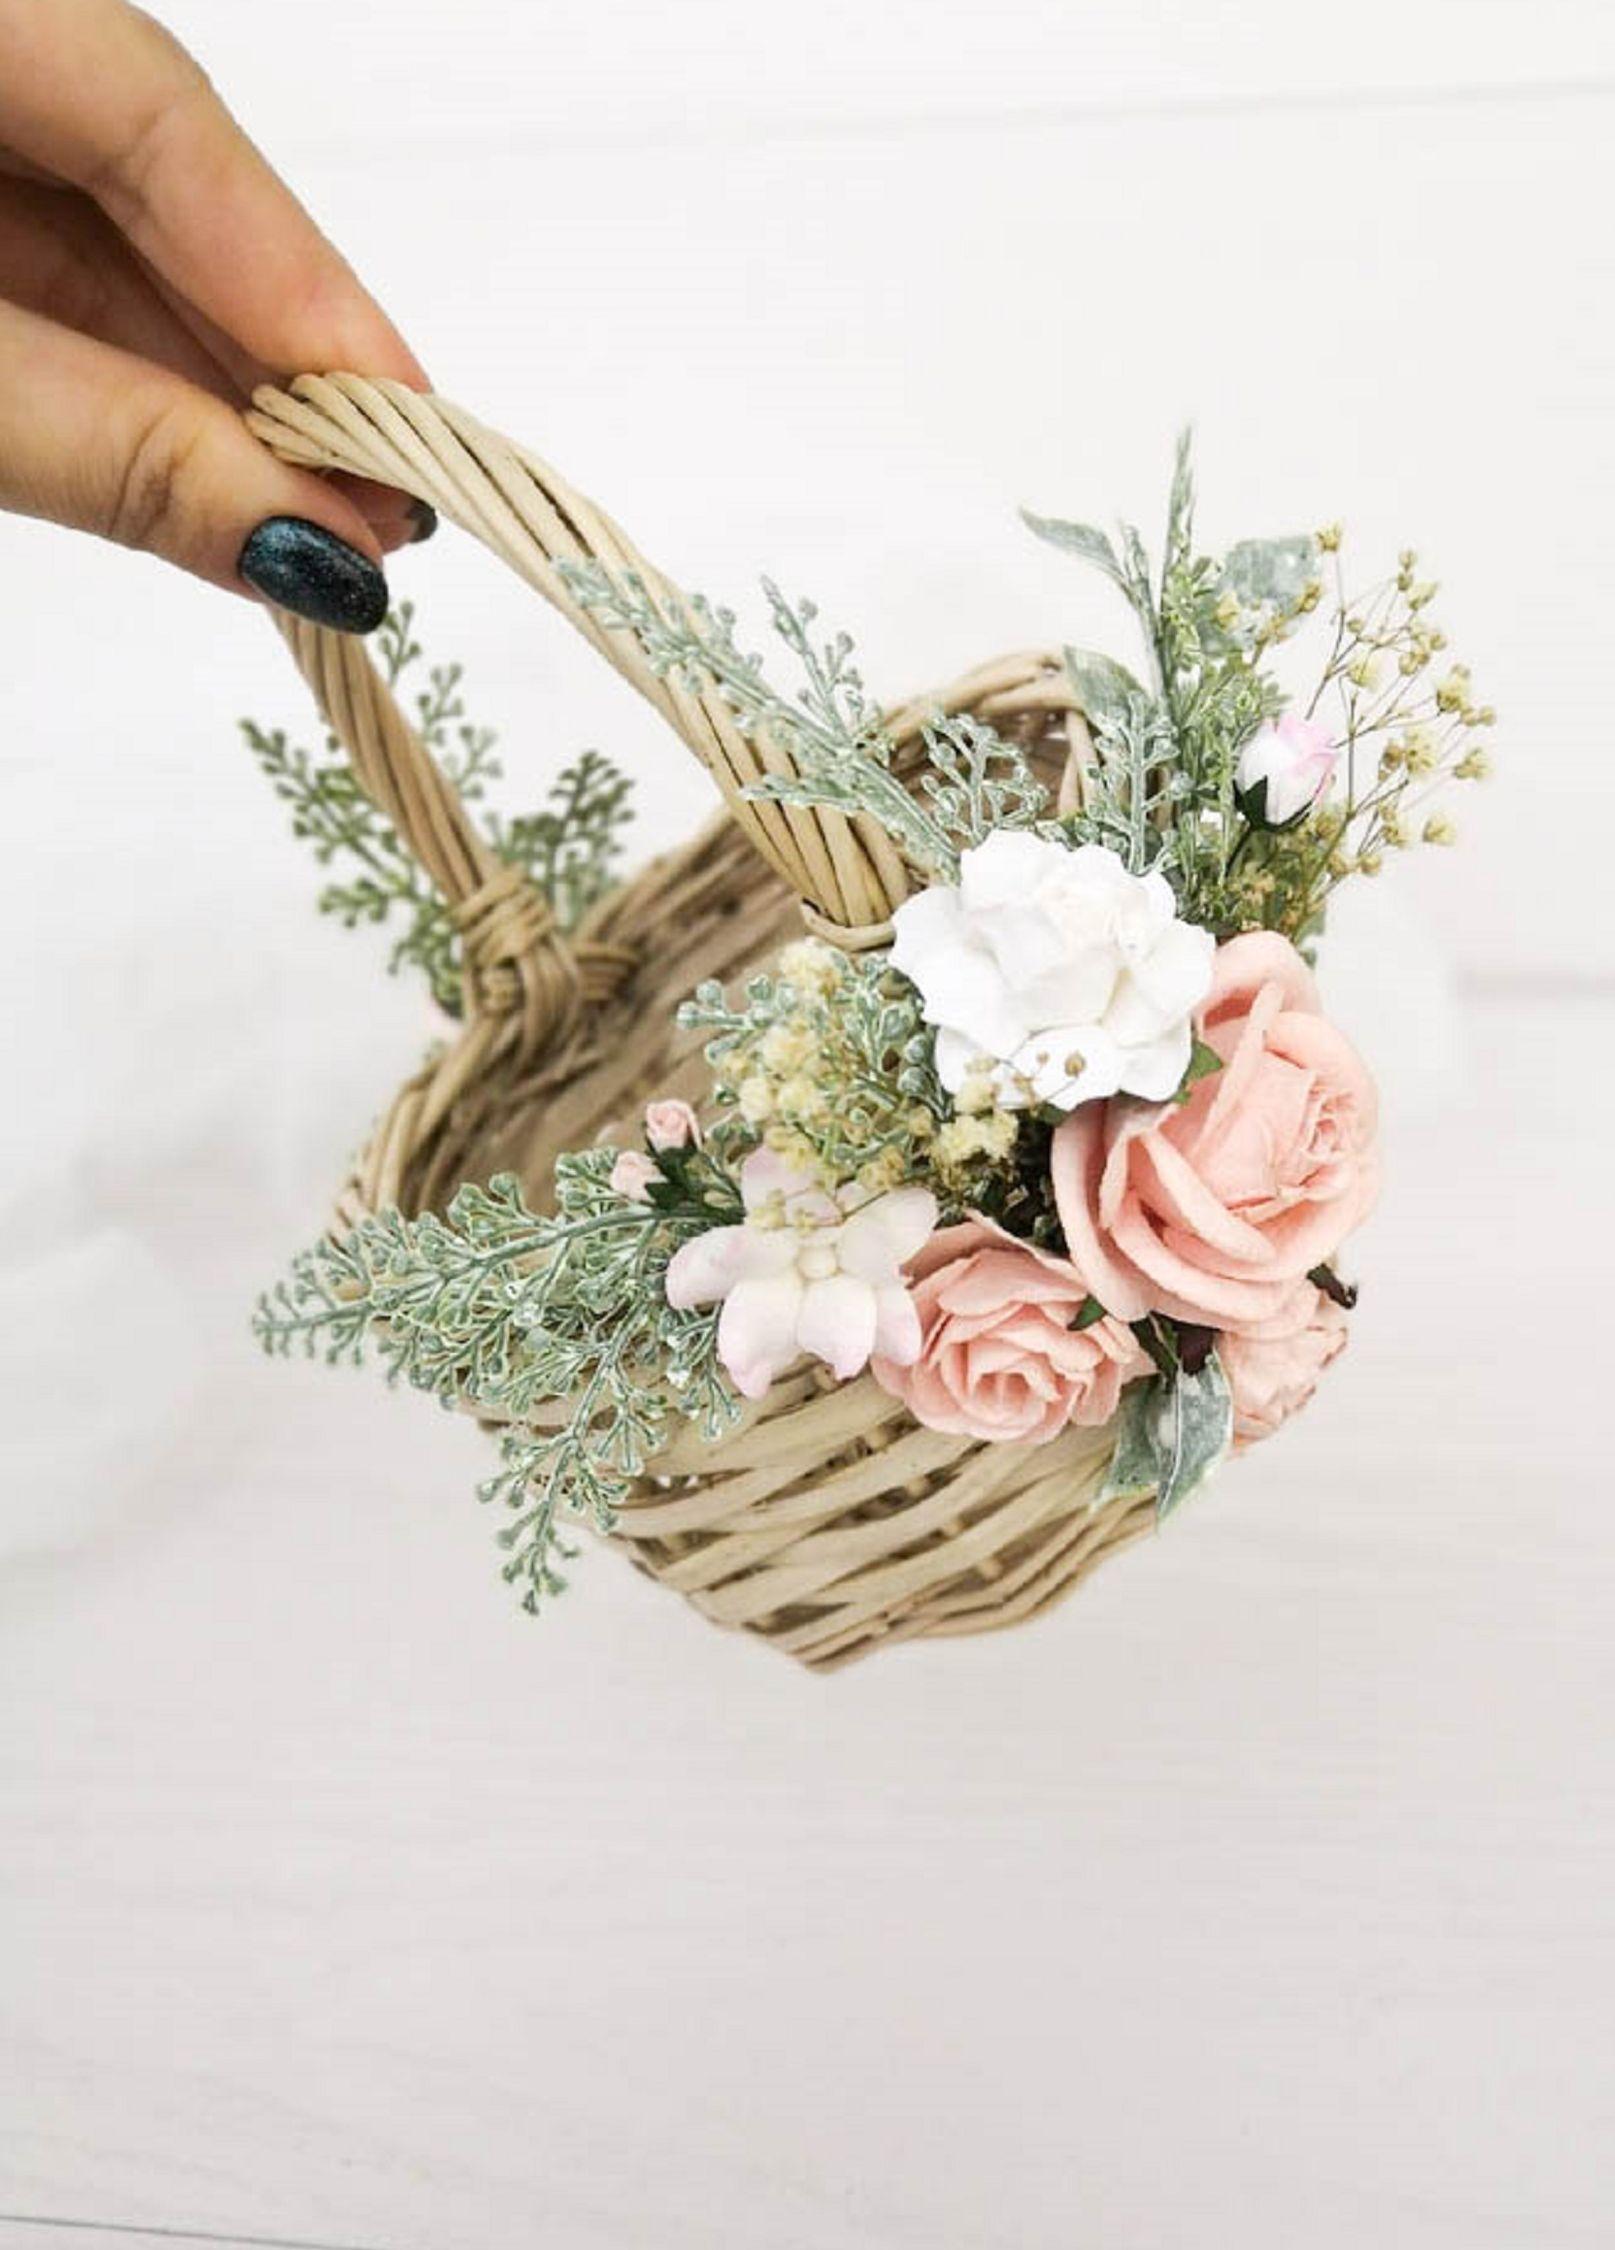 Rustic Flower Girl Basket Wedding Flower Basket Wedding Girl Basket Here Comes the Bride Rattan Flower Girl Basket Bridal Flower Basket